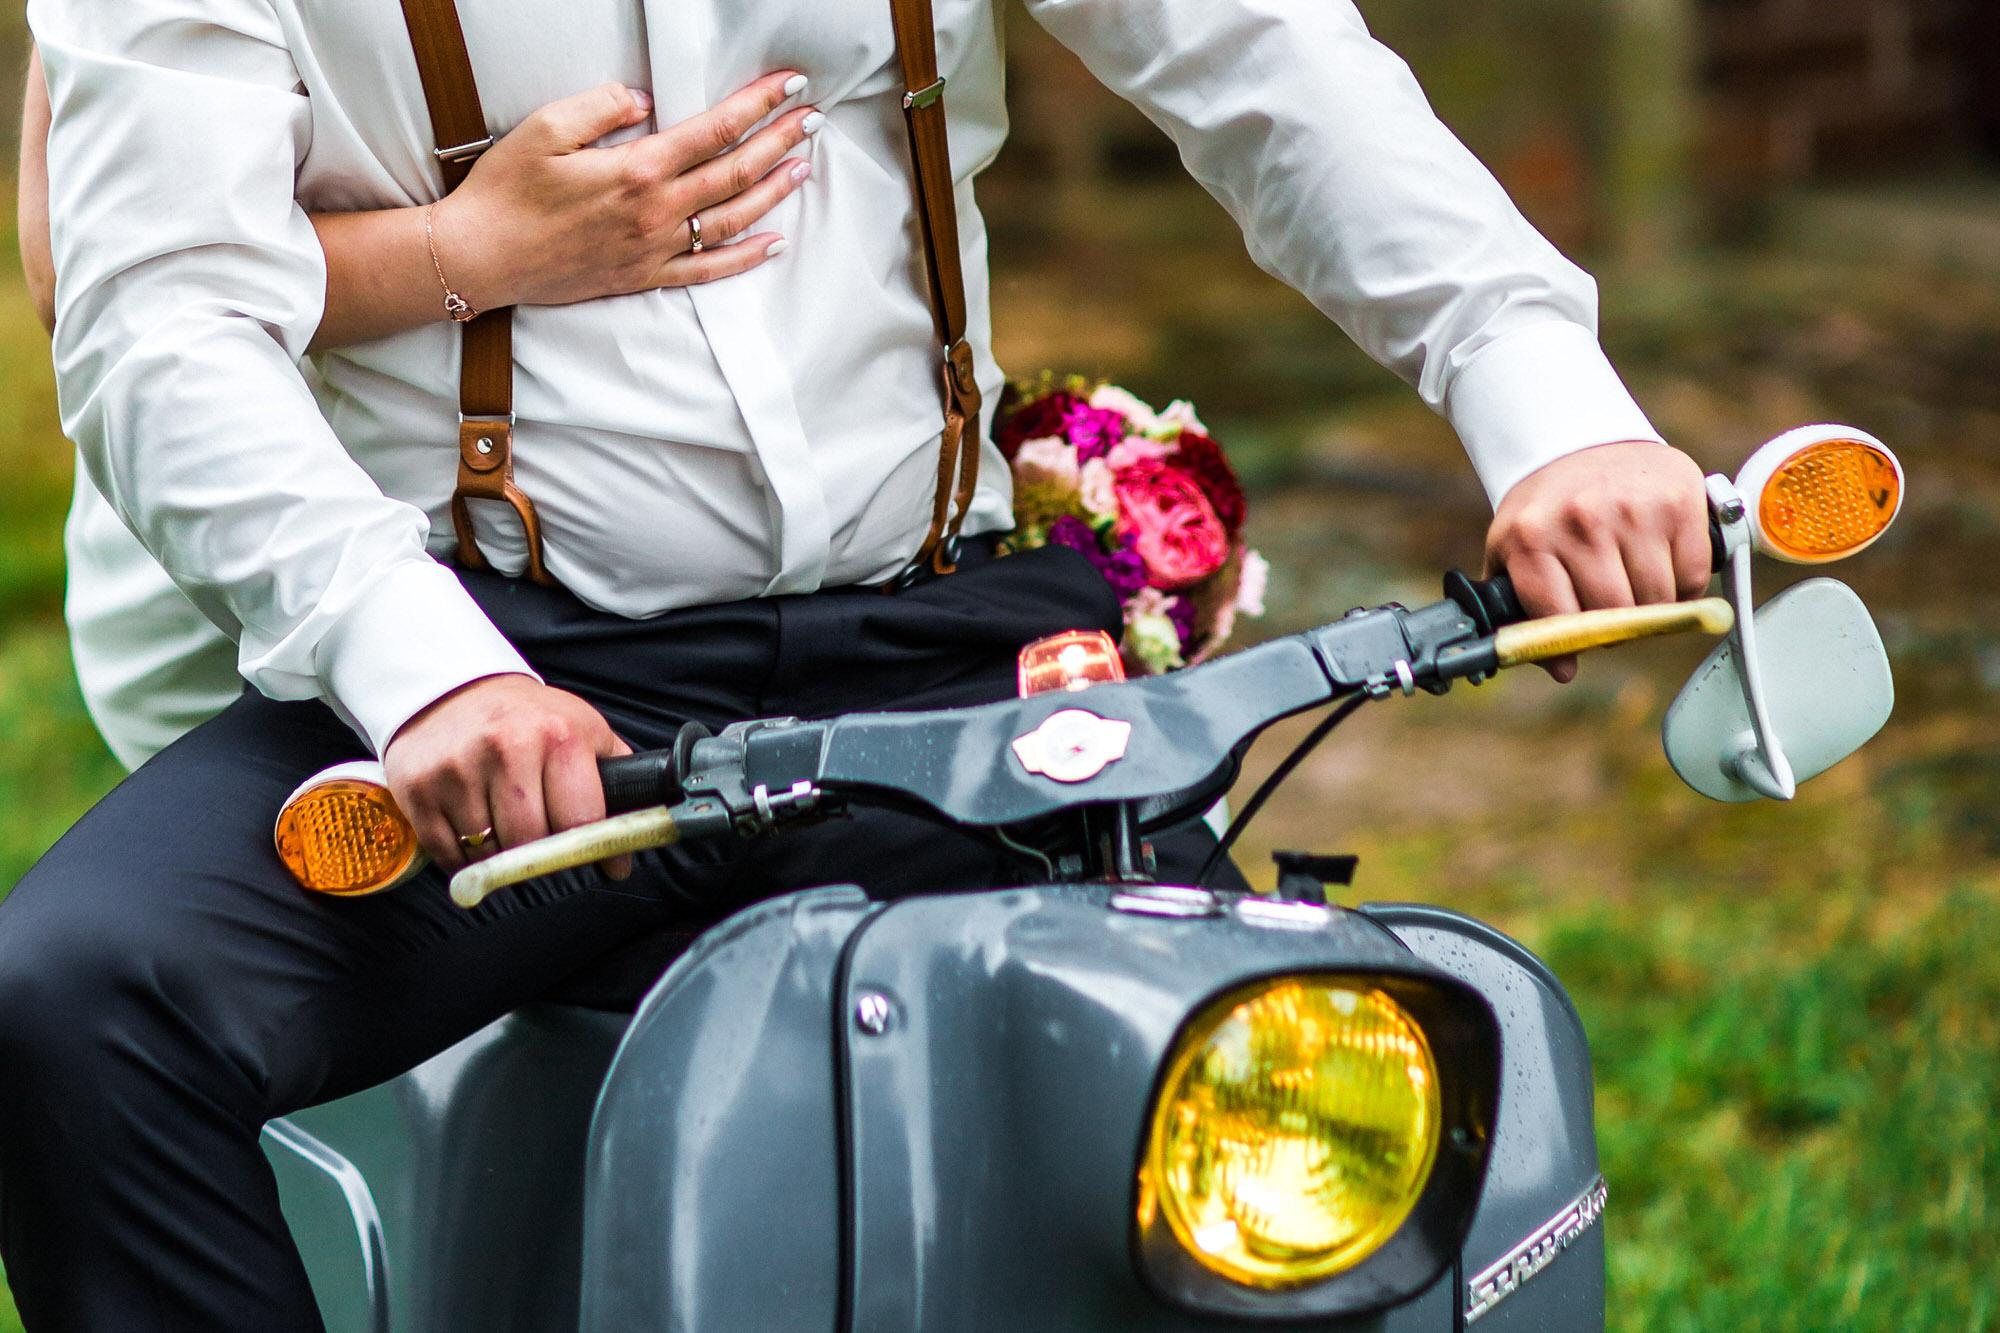 Brautpaar auf dem Moped